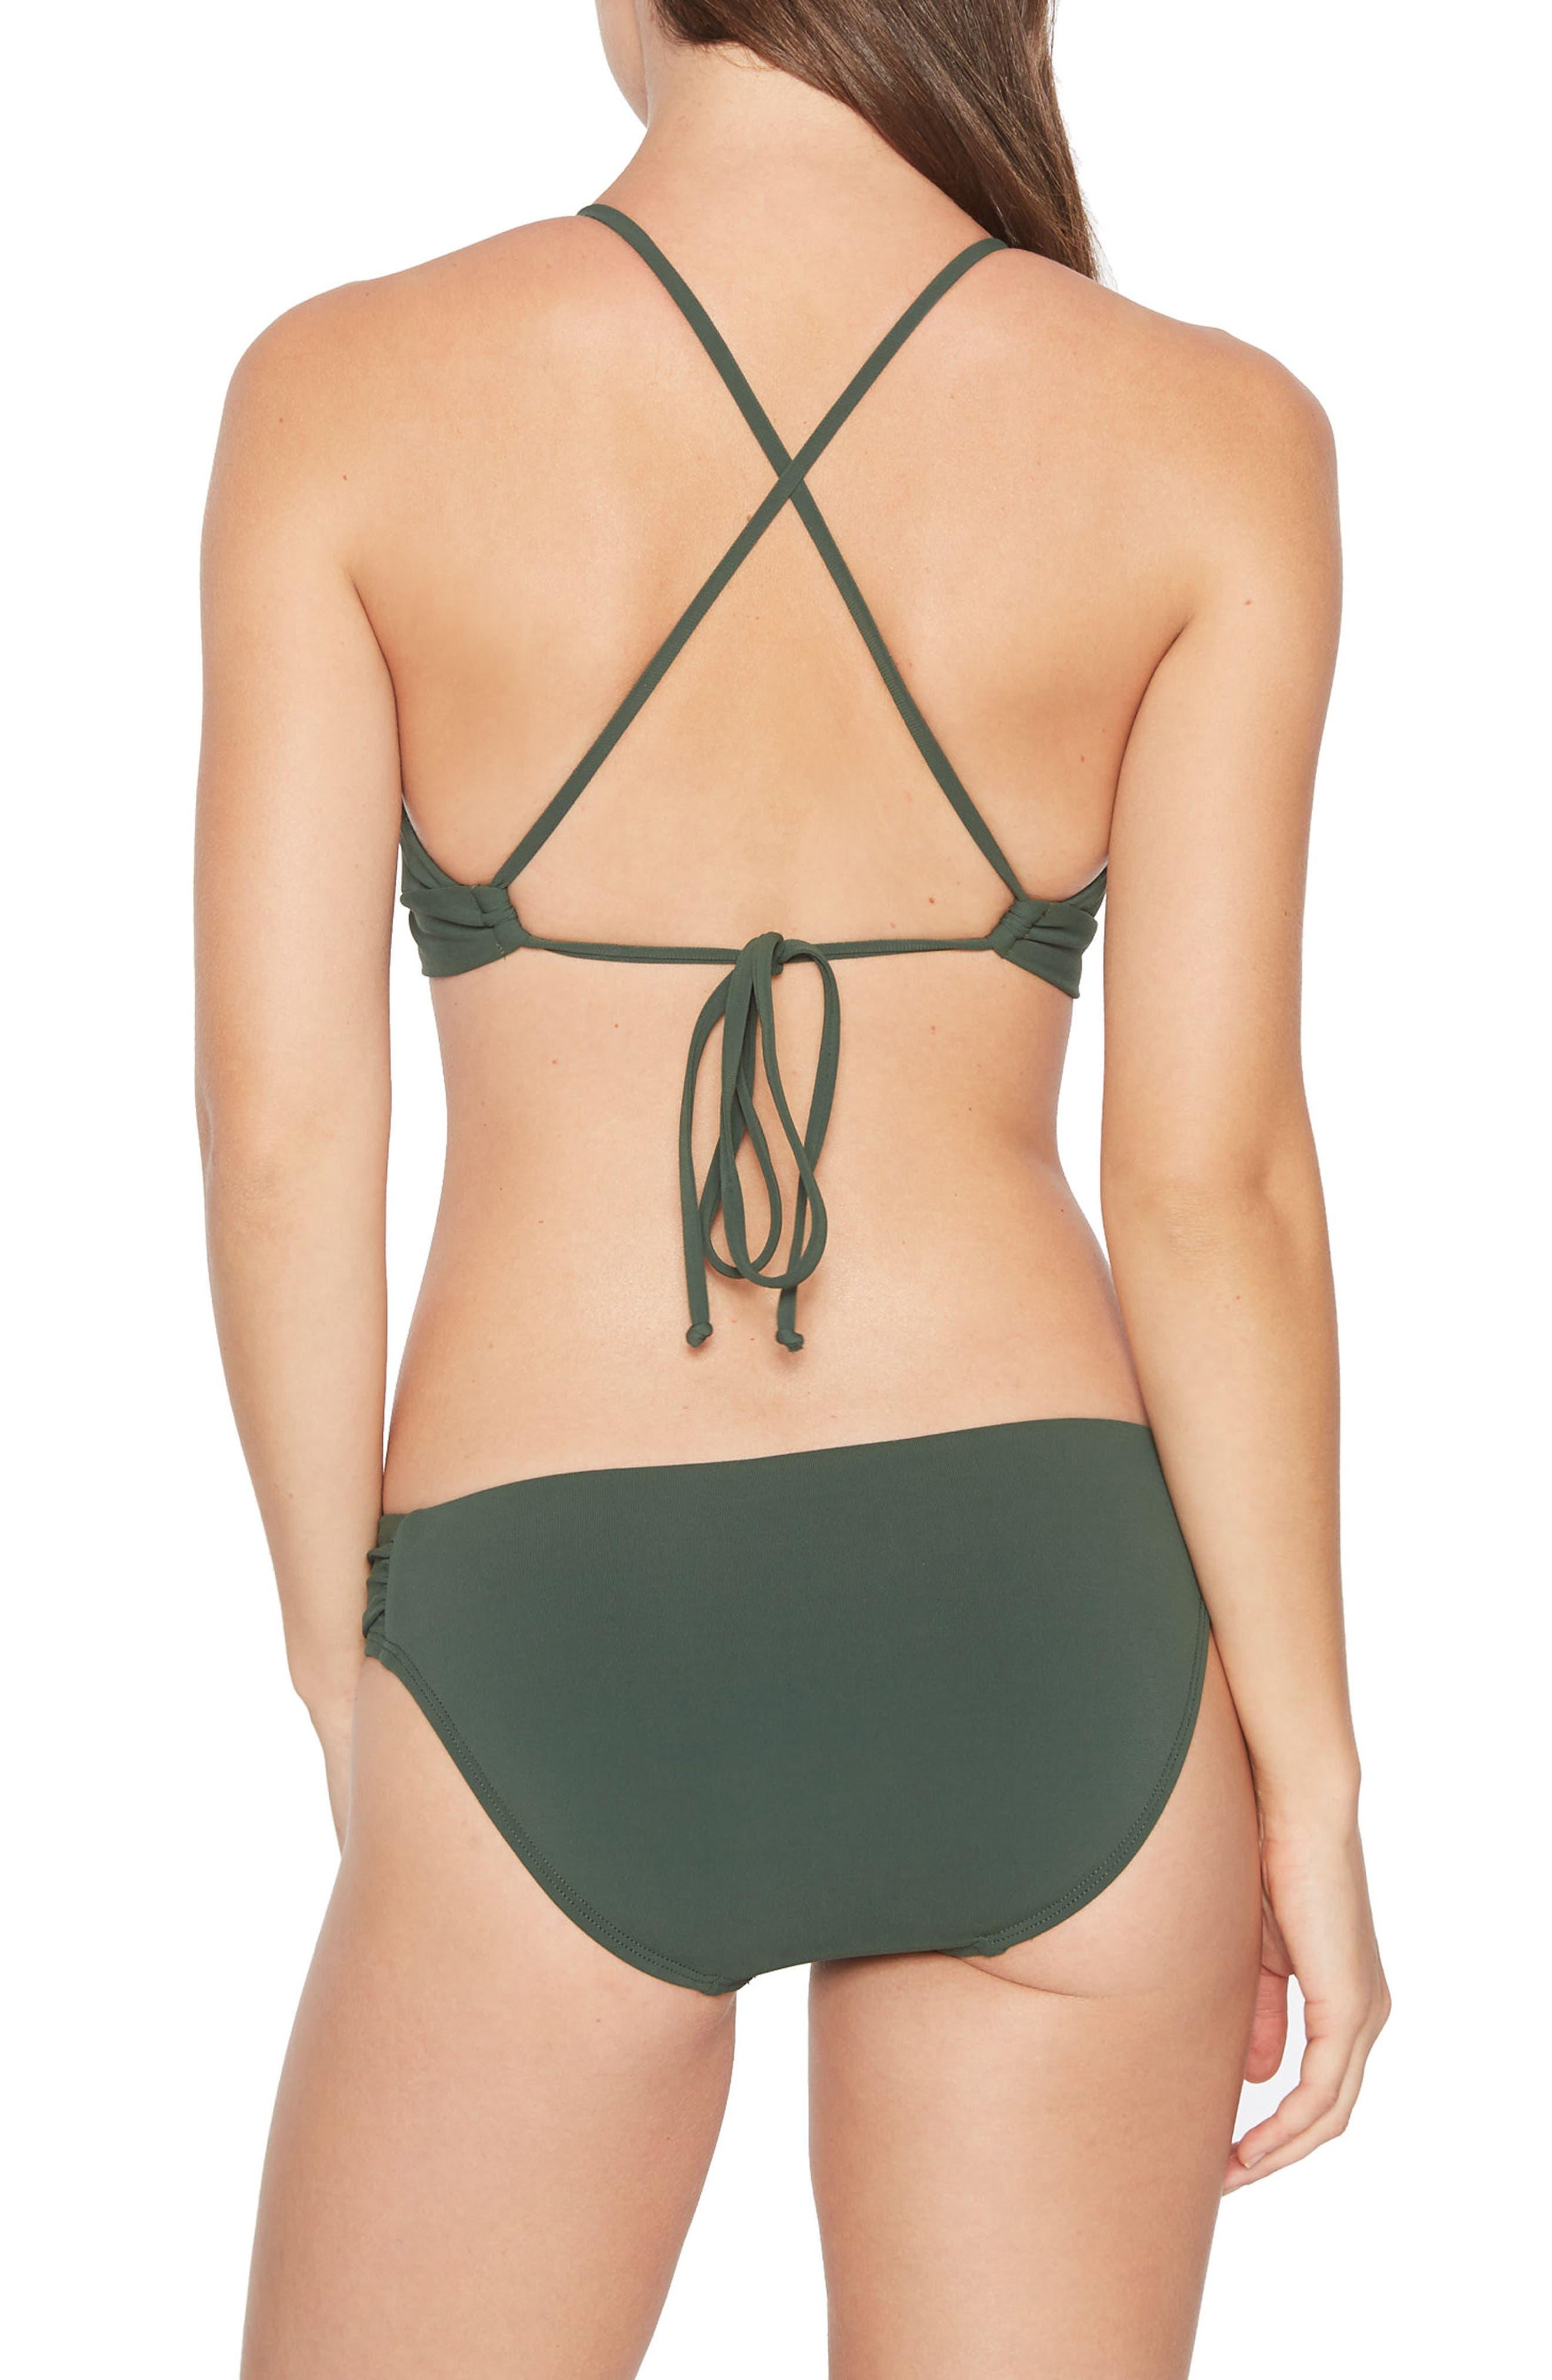 Ava Triangle Bikini Top,                             Alternate thumbnail 5, color,                             305